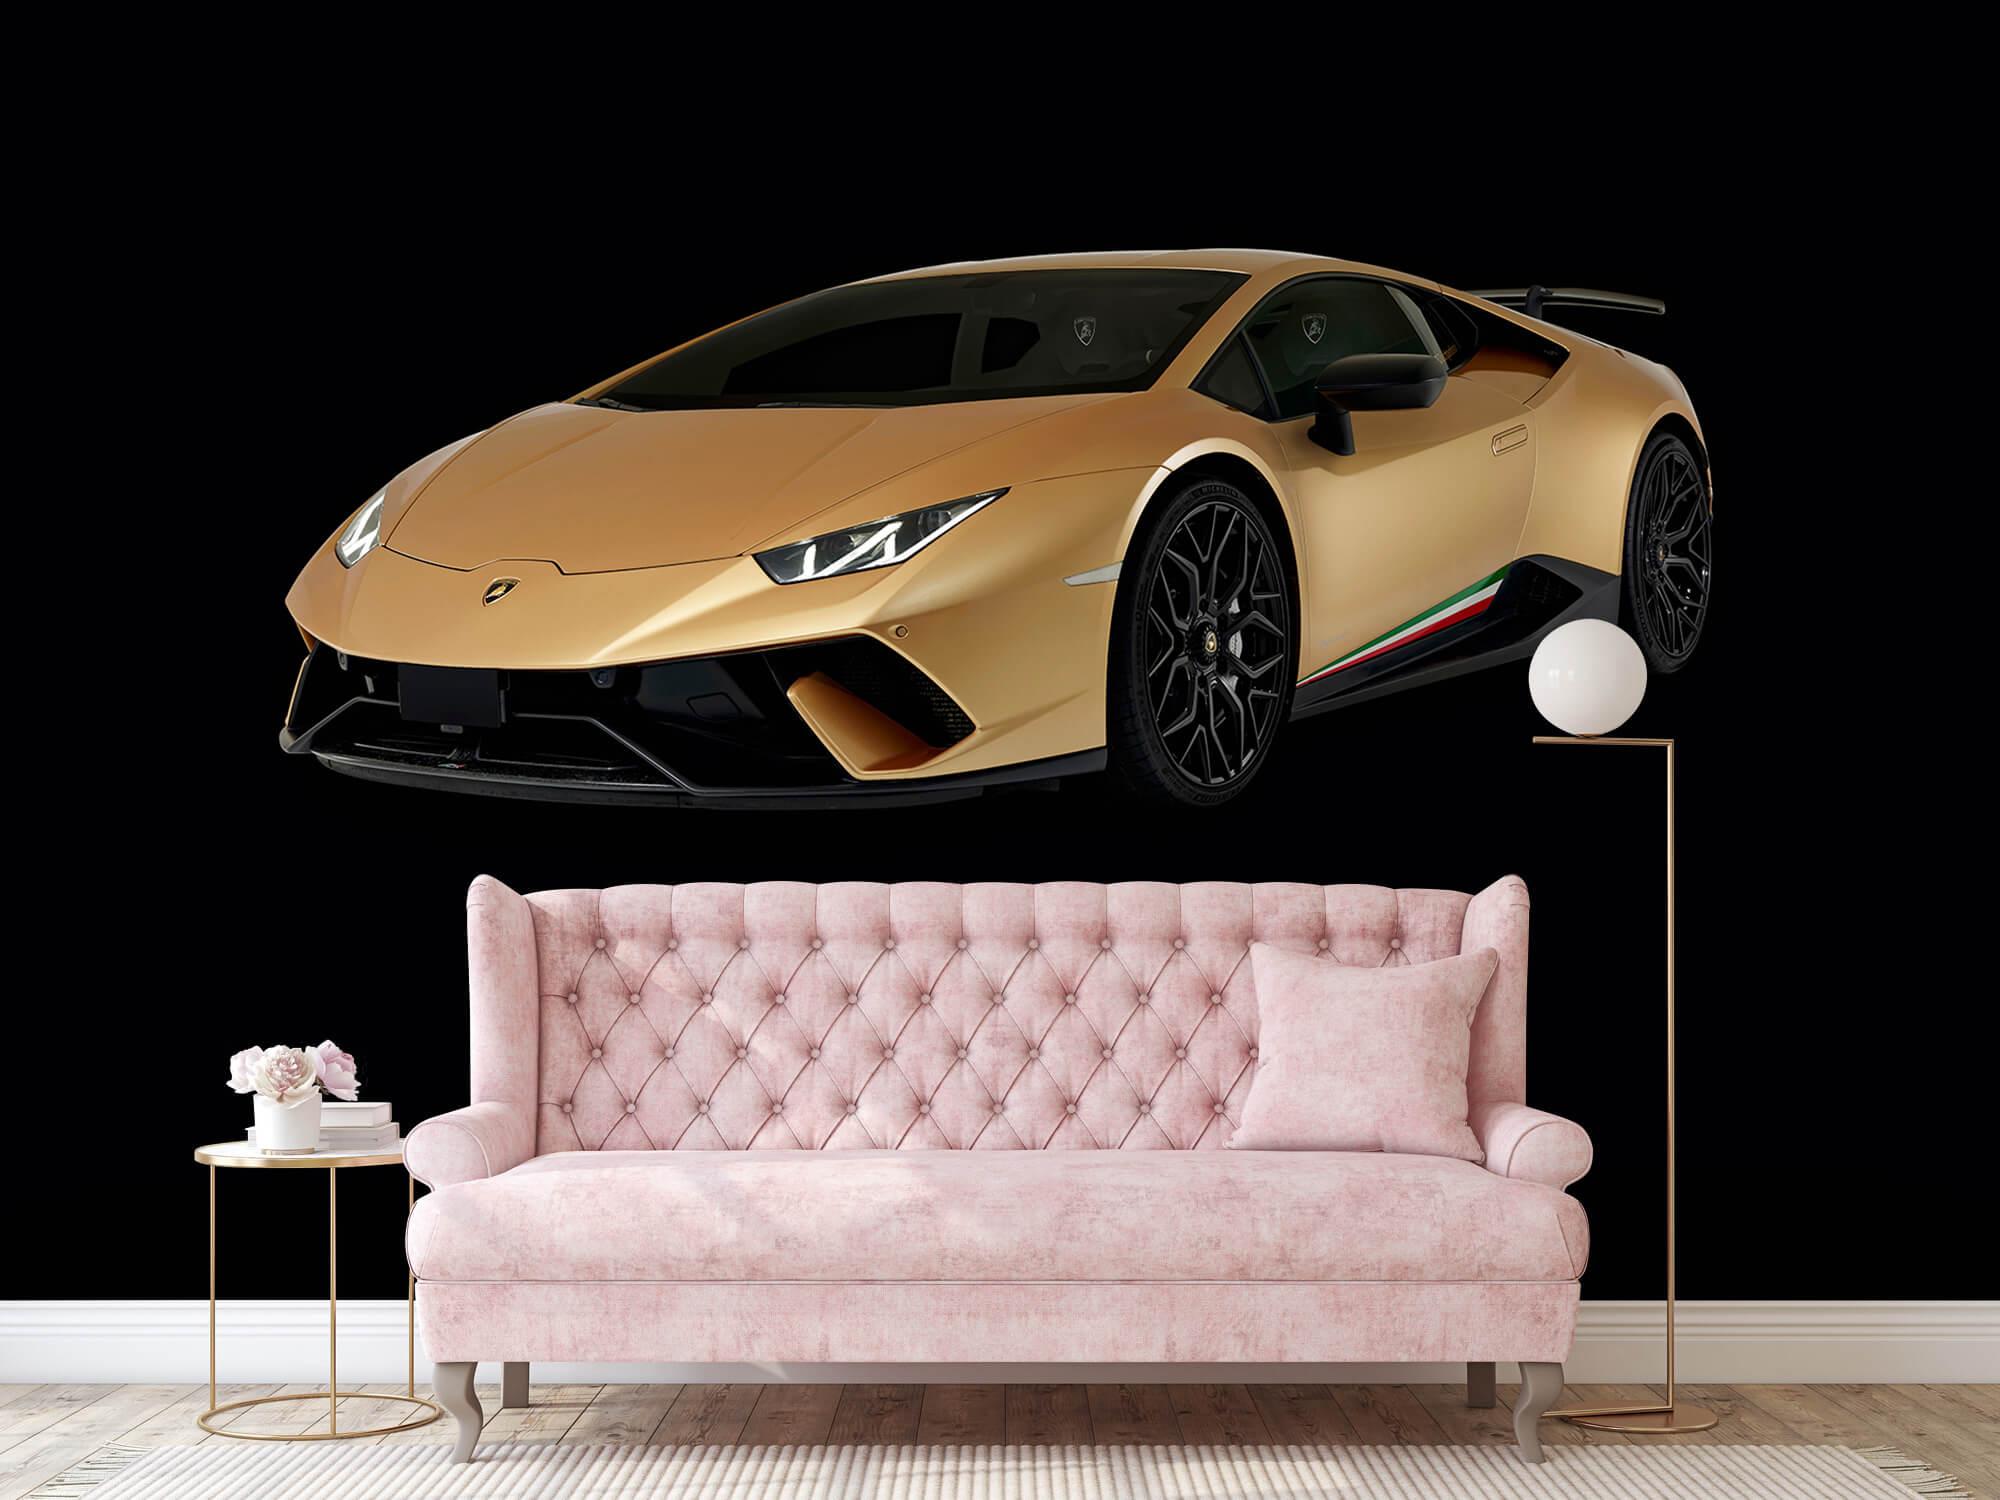 Wallpaper Lamborghini Huracán - Rechter voorkant, zwart 13